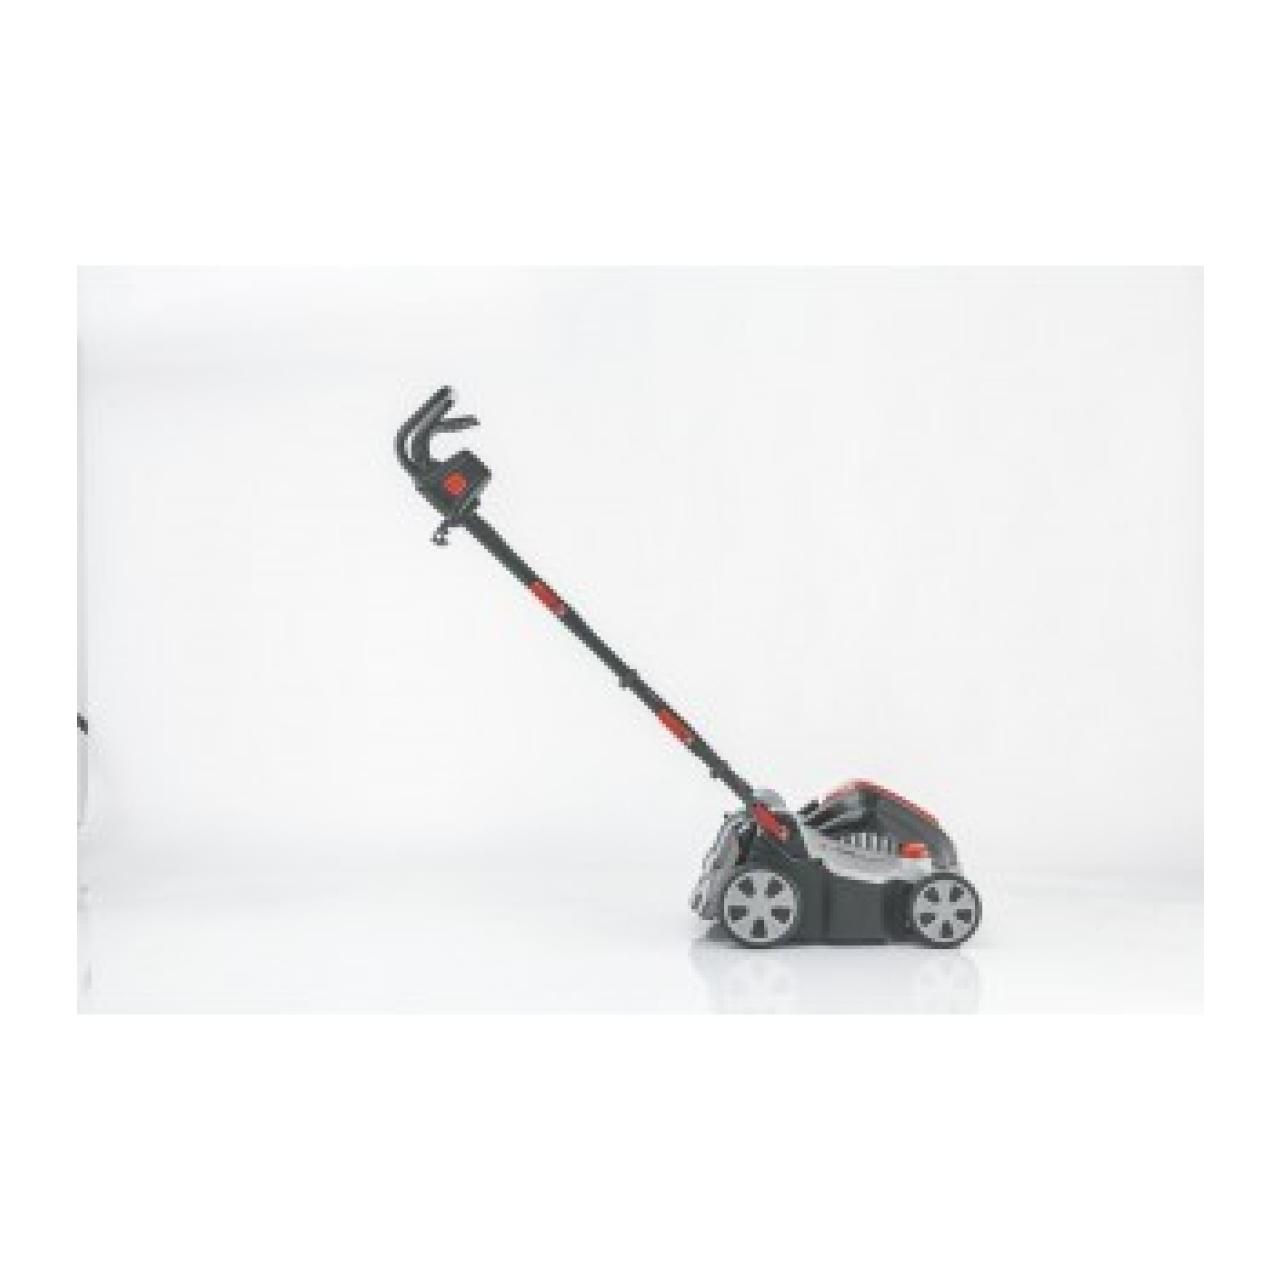 Elektro-Vertikutierer Combi Care 36.8 E Comfort